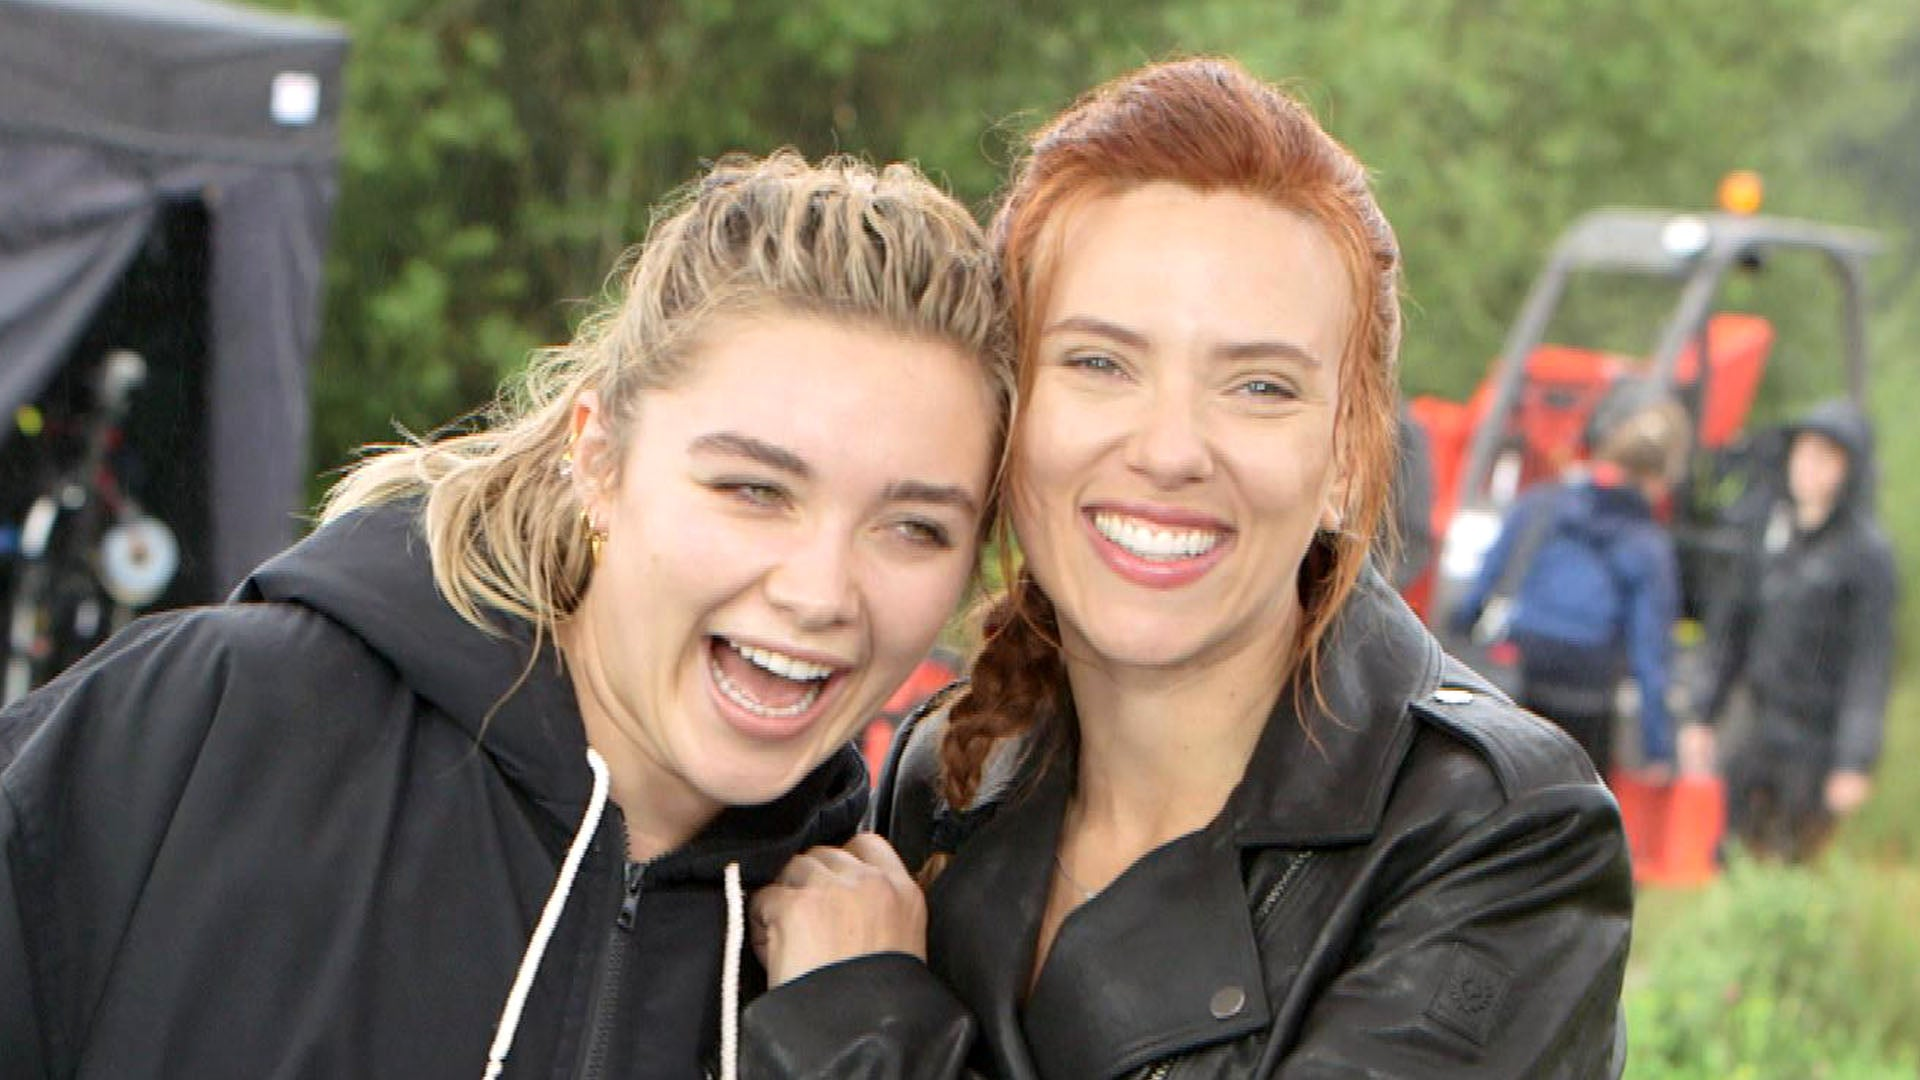 Scarlett Johansson and Florence Pugh Black Widow cast